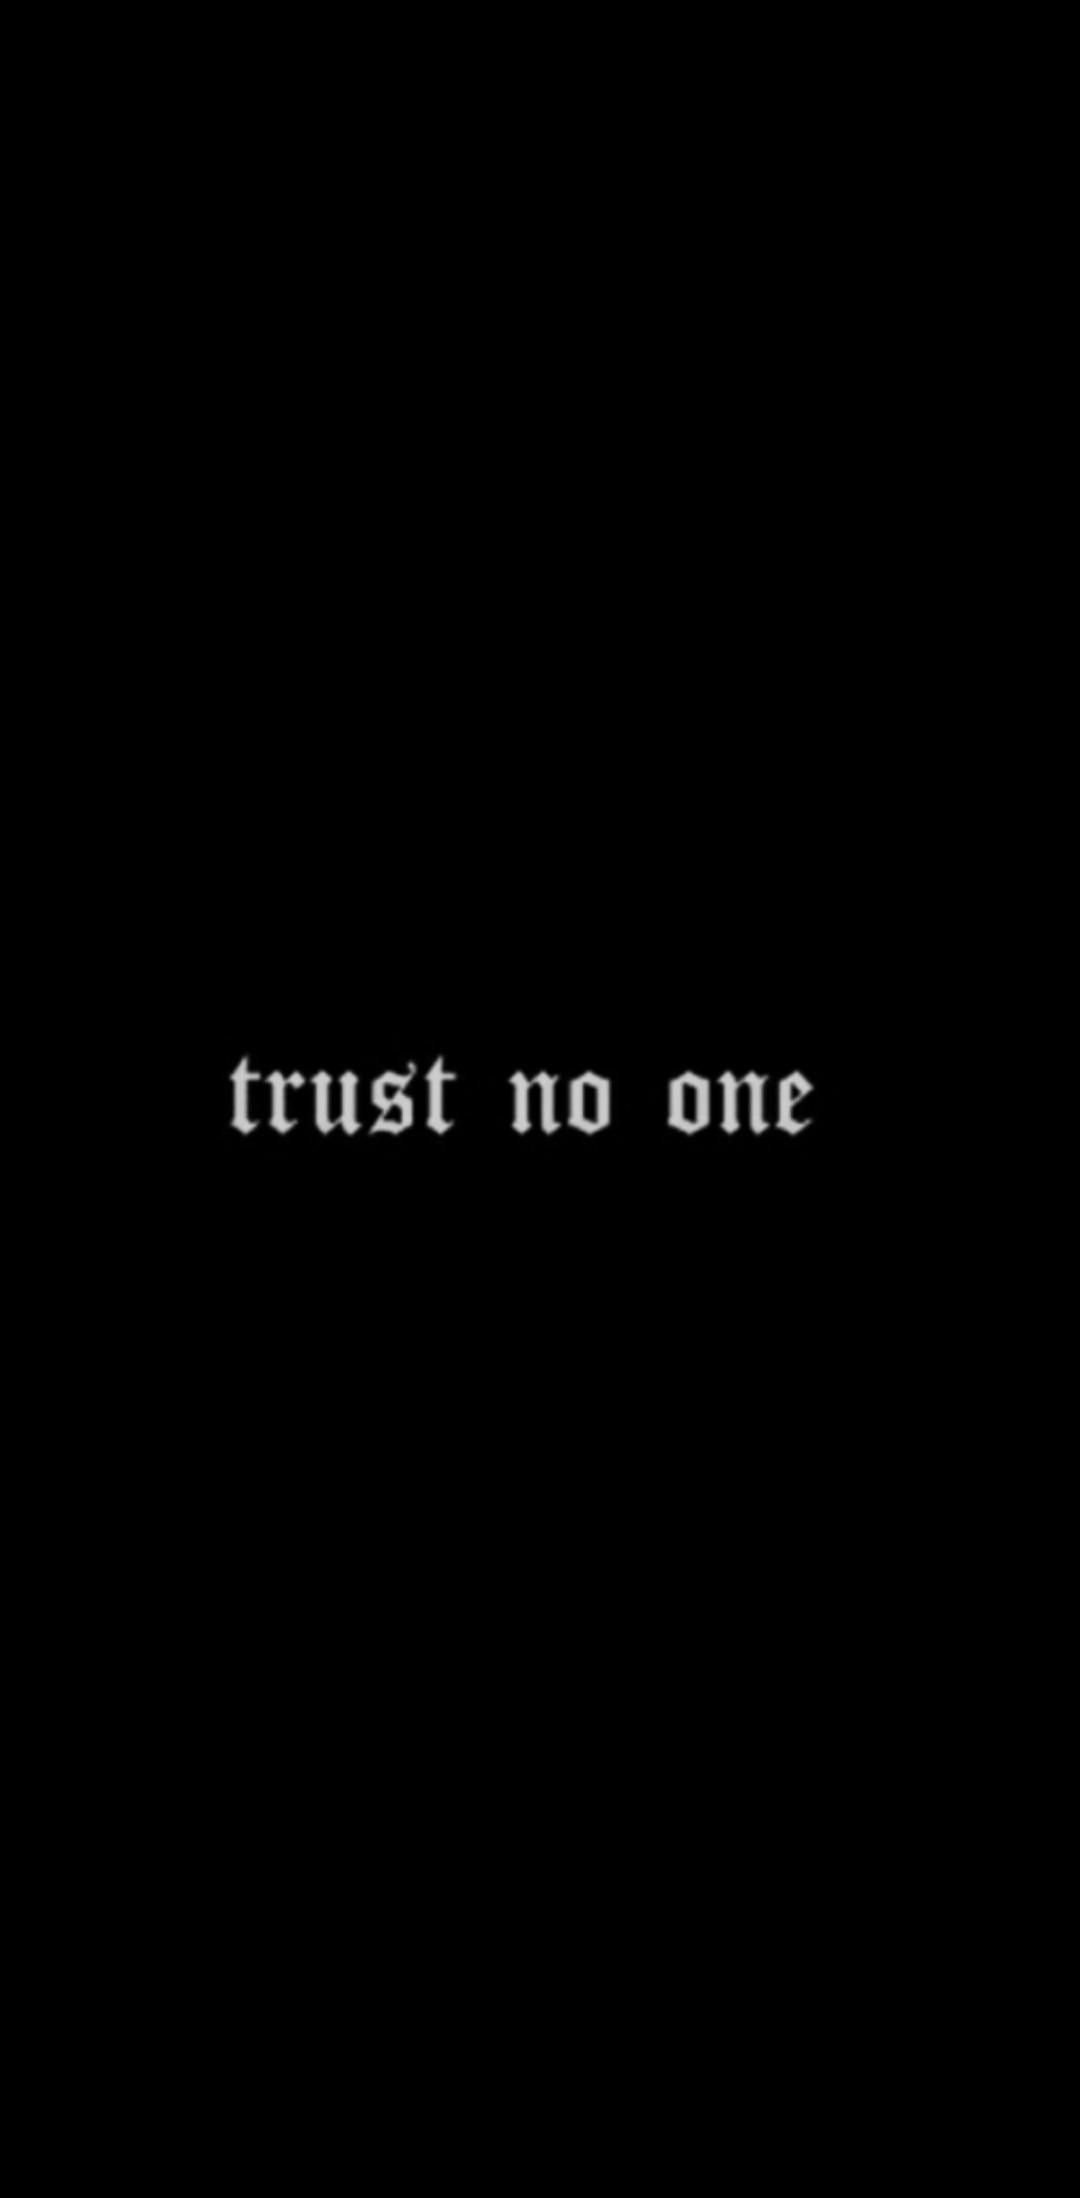 Trust No One Wallpaper In 2021 Cute Black Wallpaper Bad Girl Wallpaper Dark Black Wallpaper Dark wallpaper of death